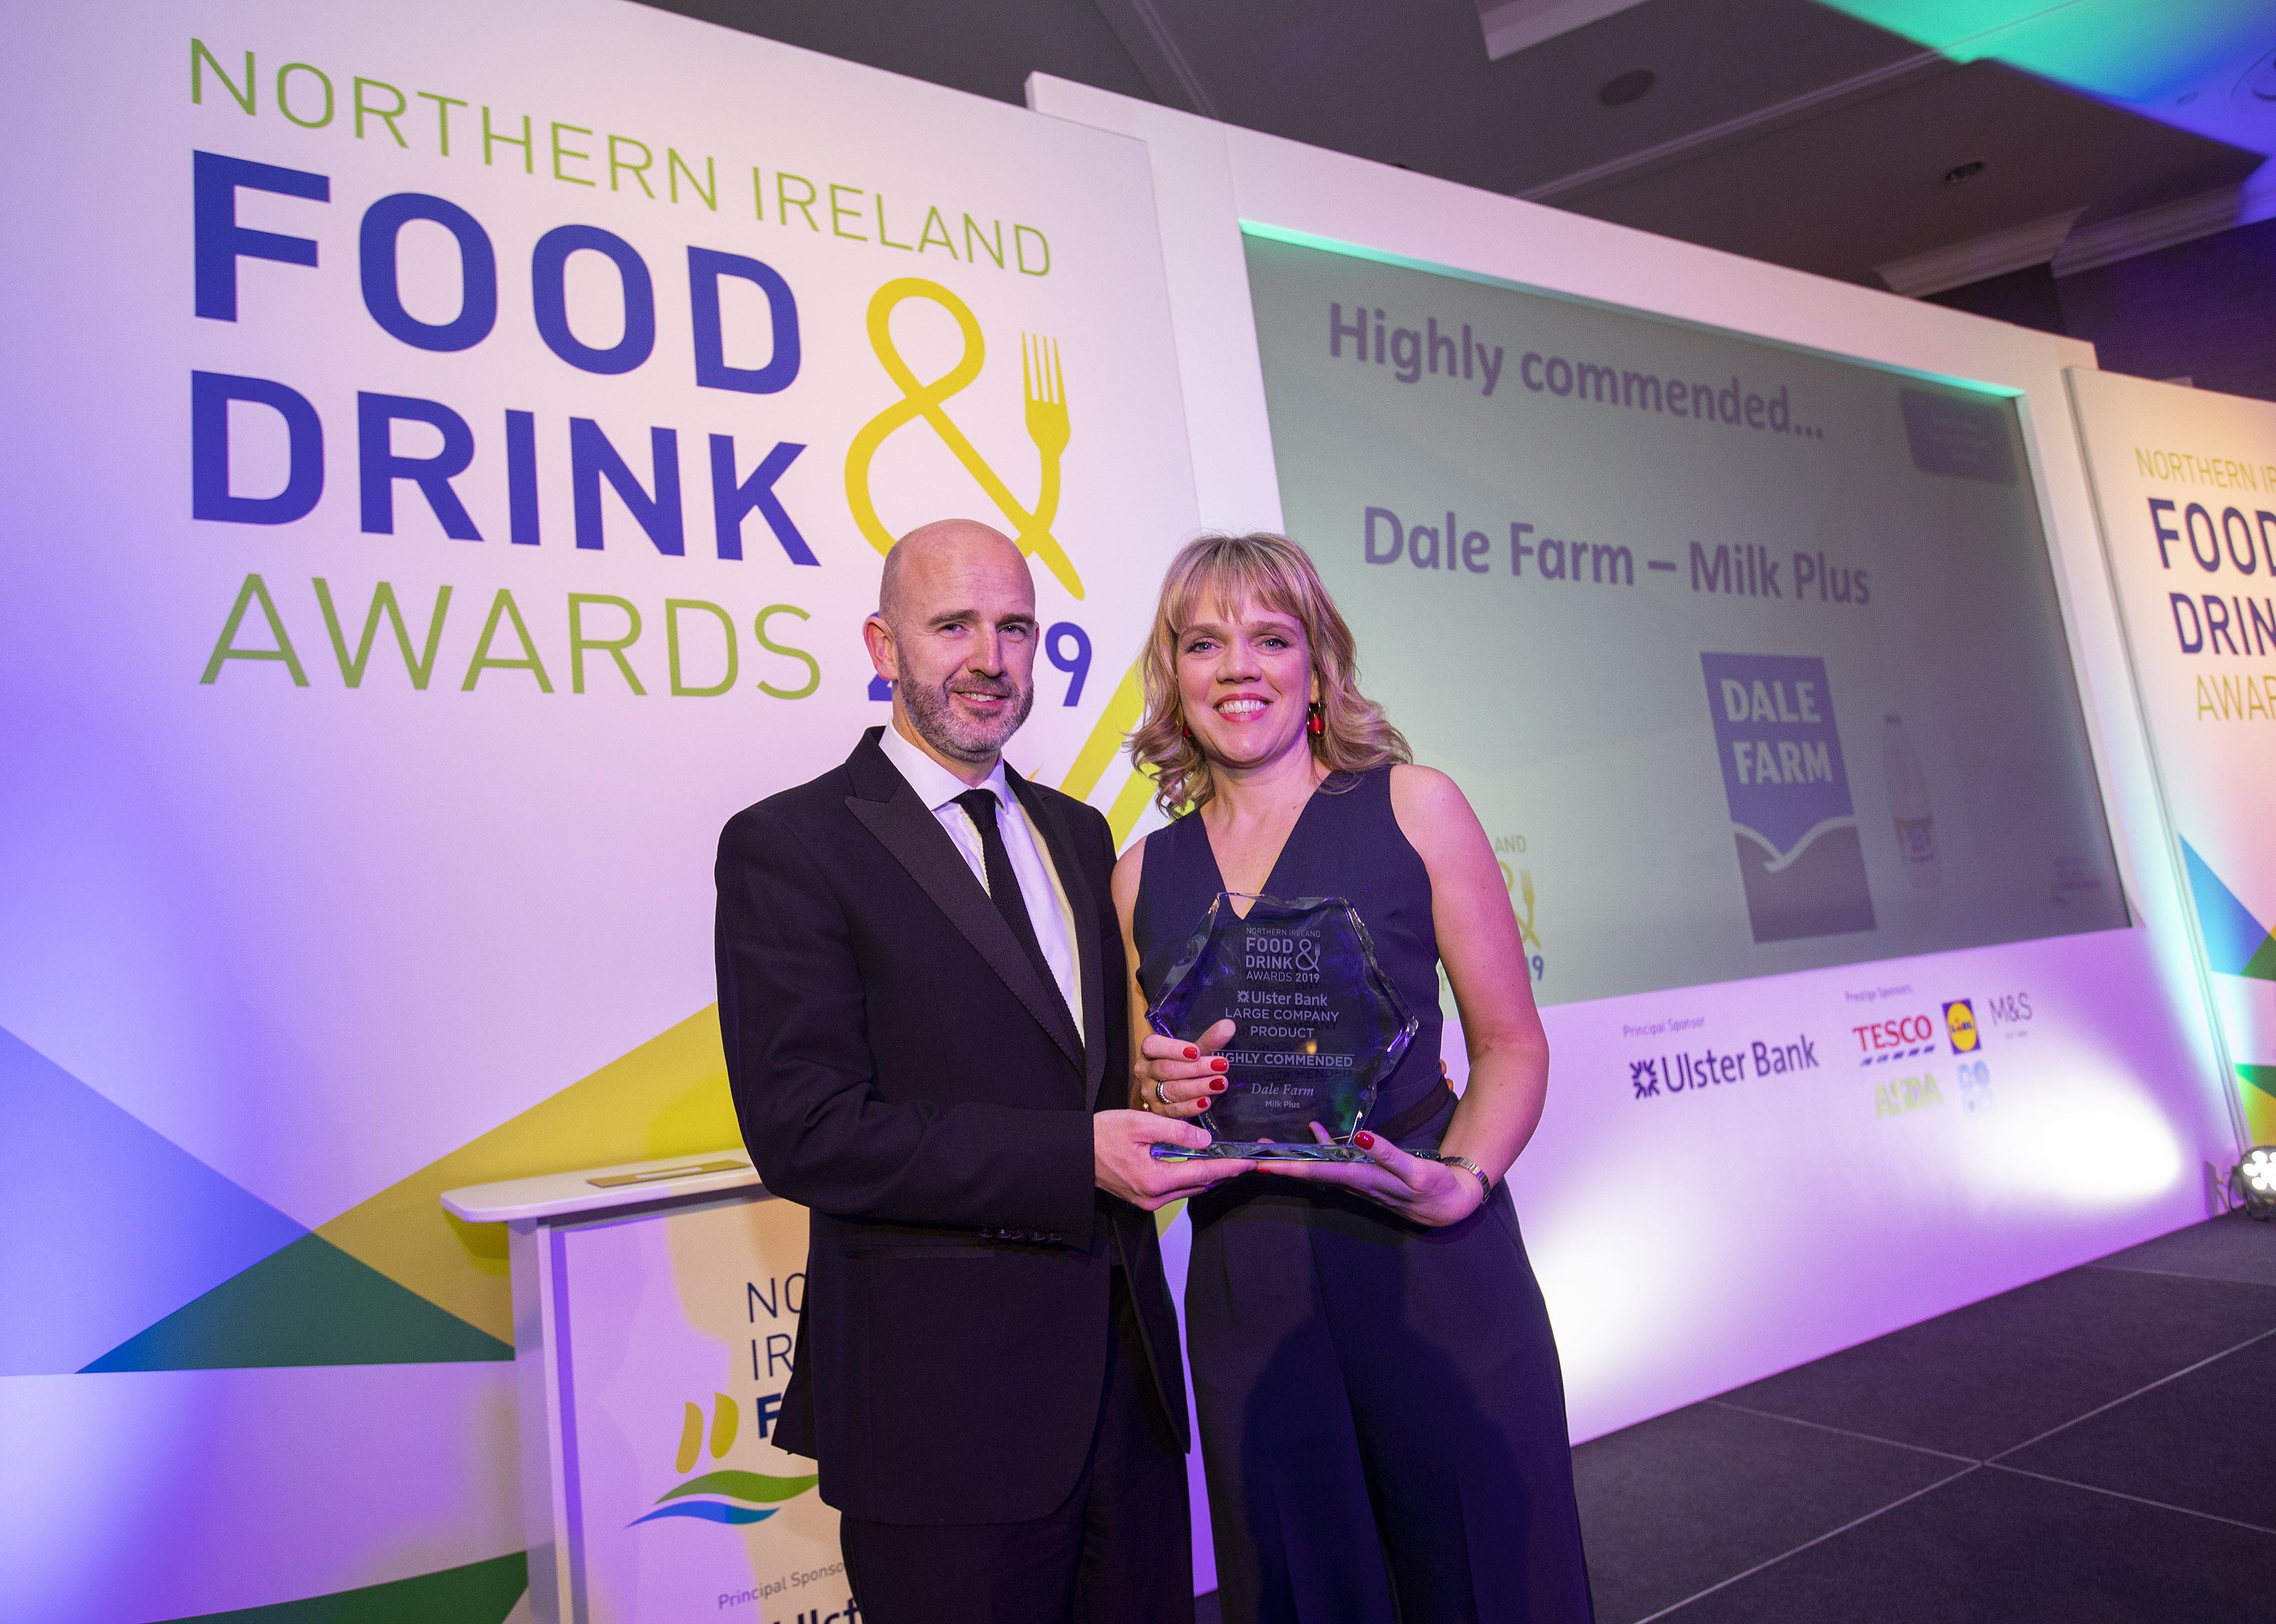 Dale Farm recognised in 2019 NIFDA Awards